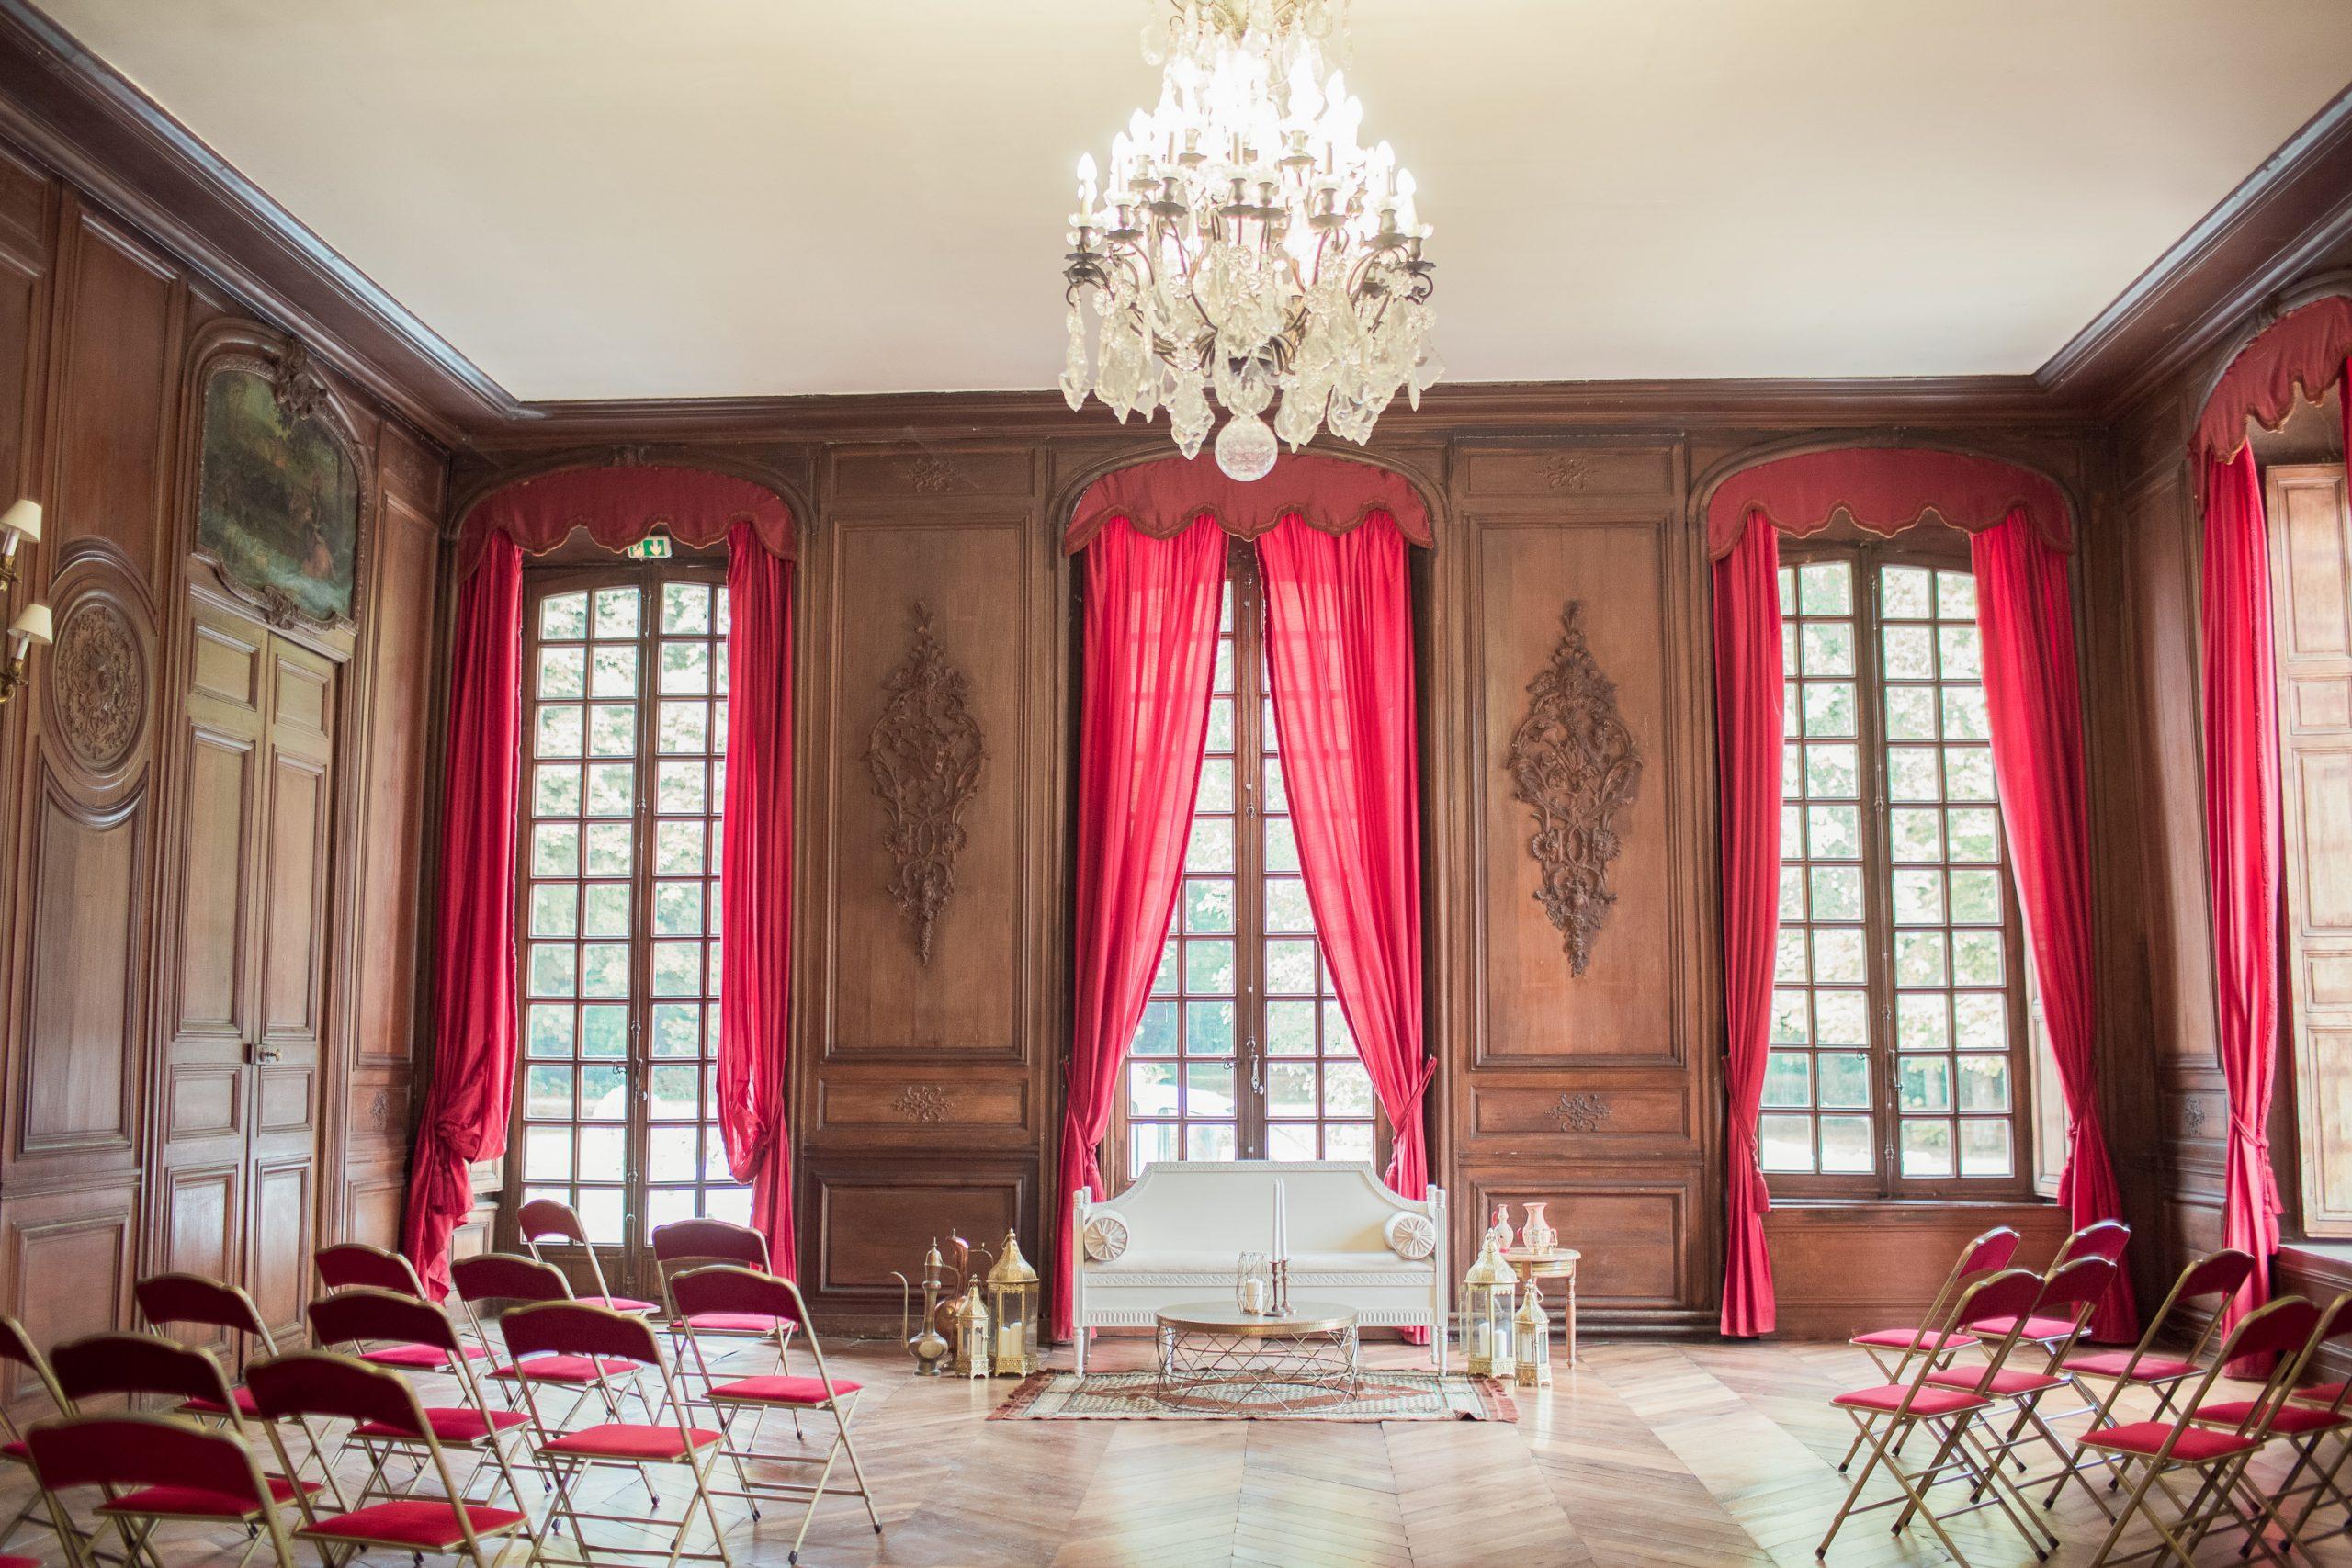 photographe-mariage-chateau-nandy-decoration